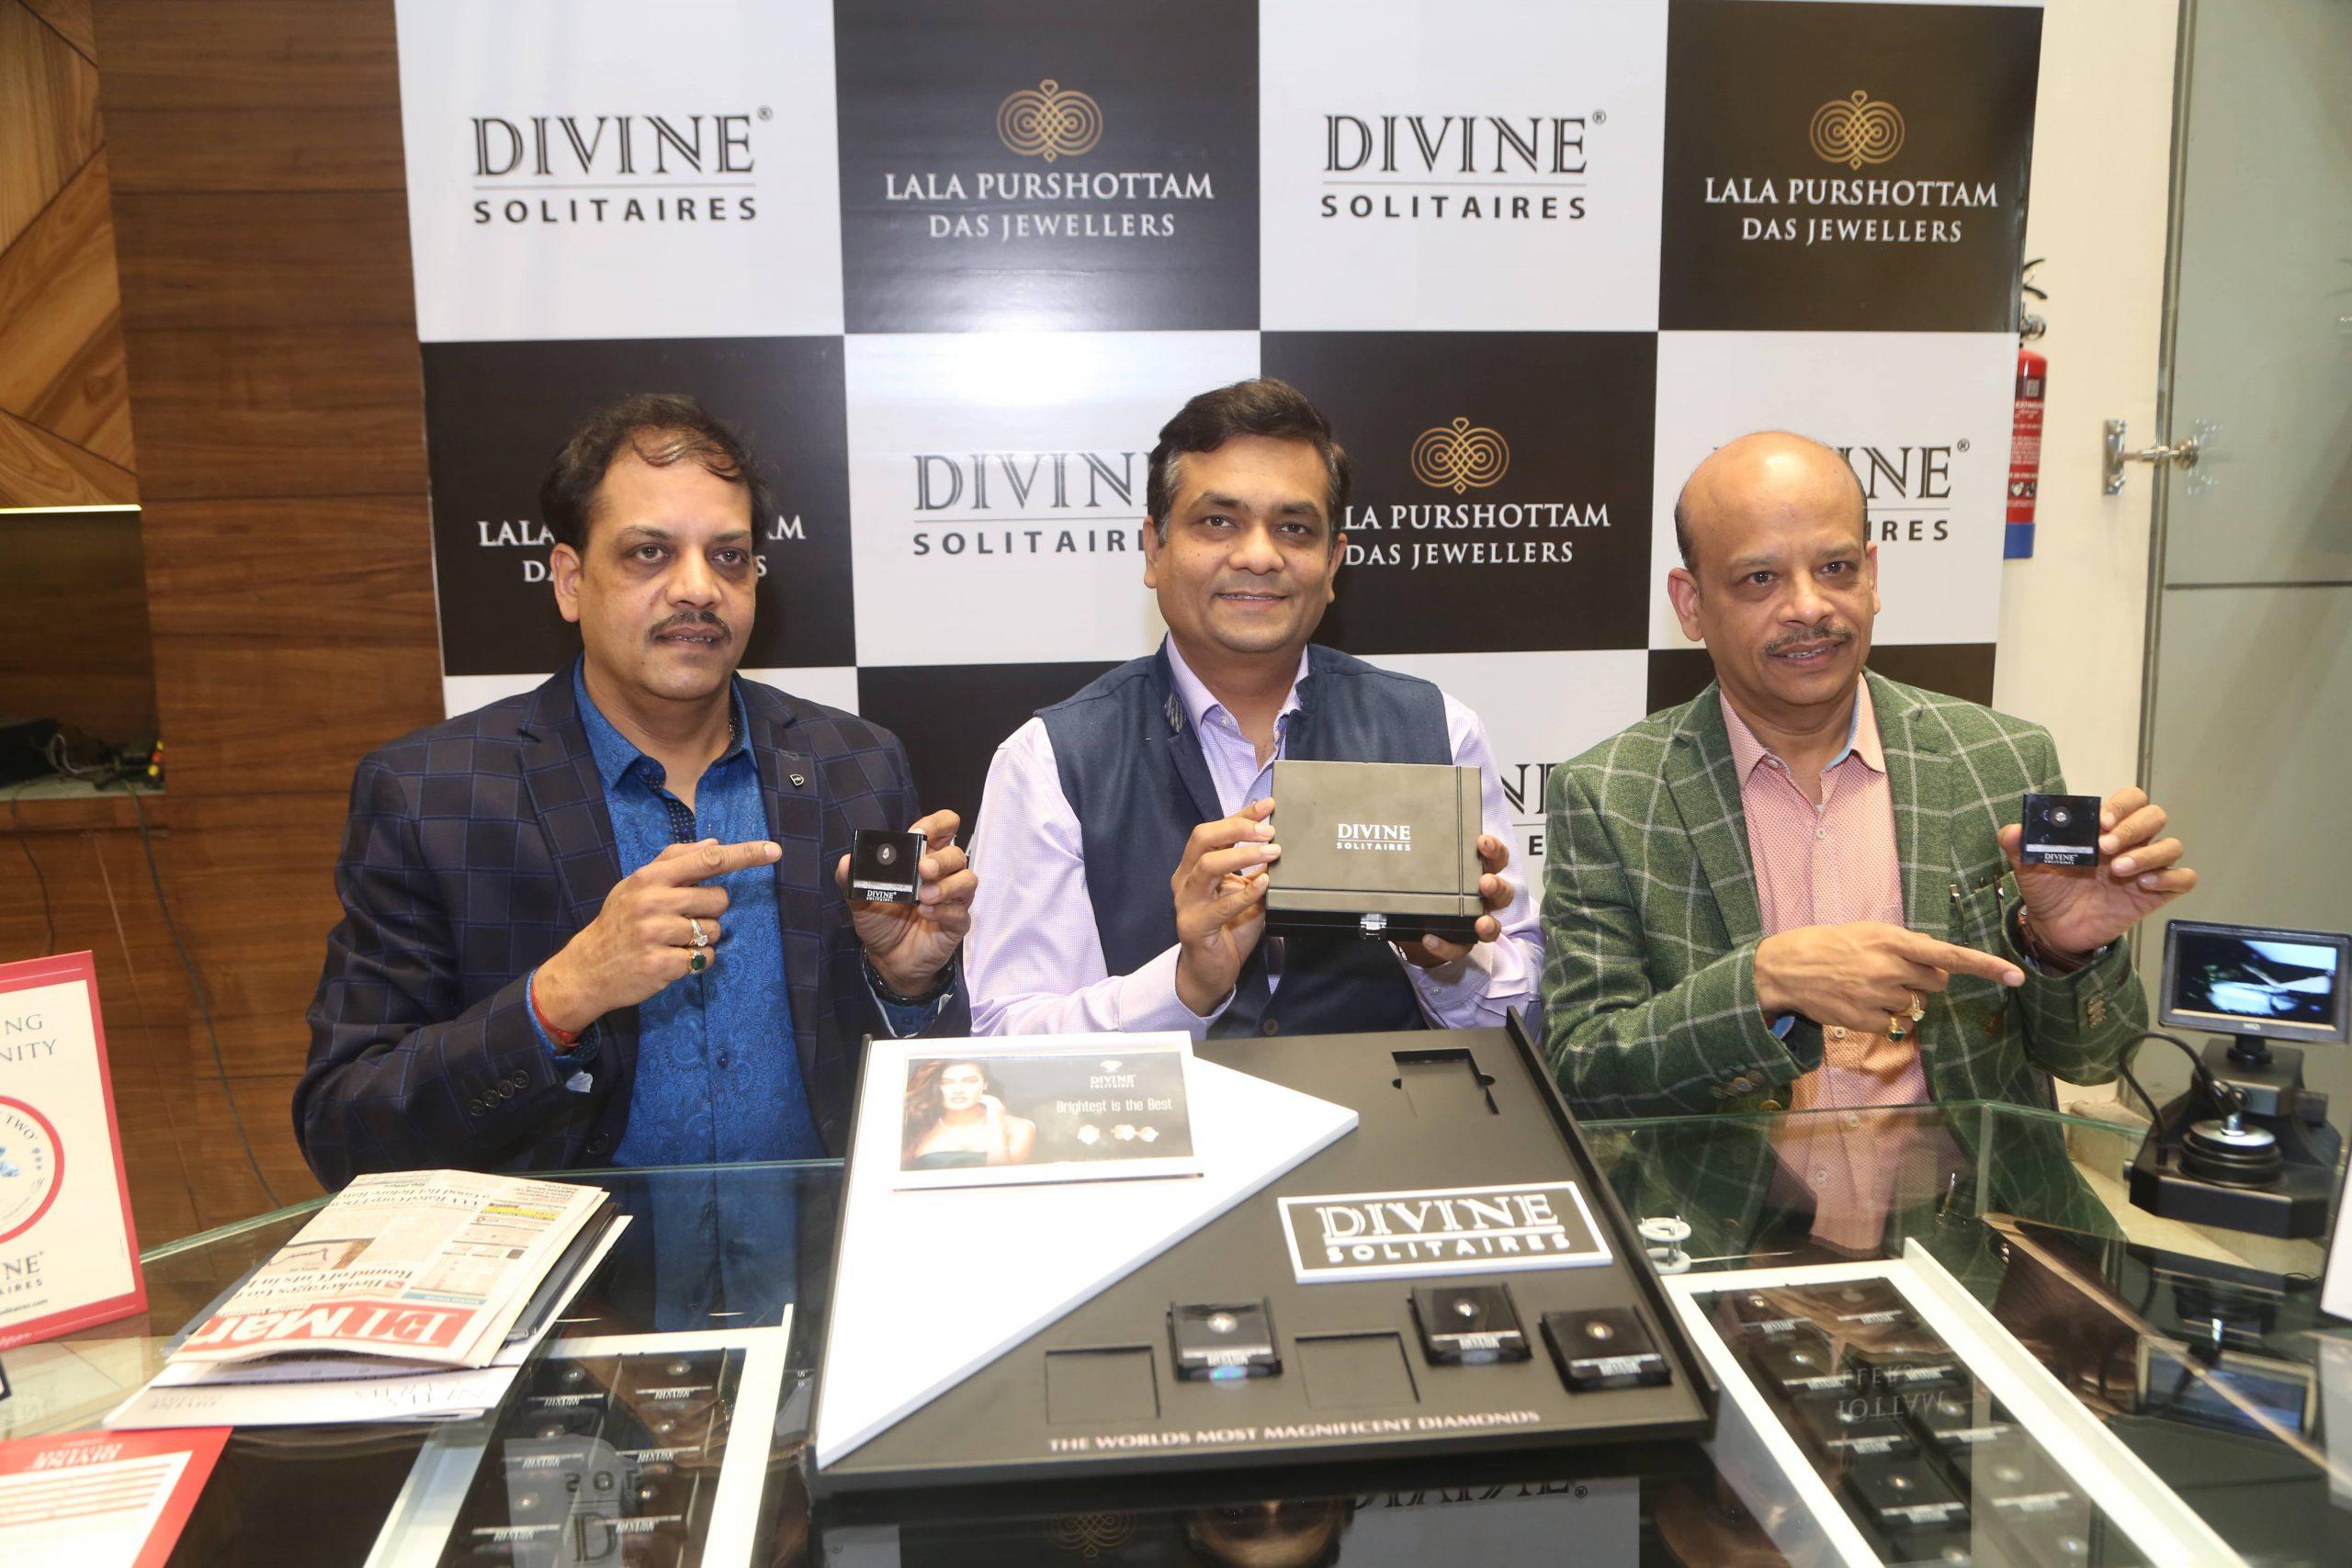 From LtoR - Mr. Vivek Gupta, Director Lala Purshottam Das Jewellers, Mr. Jignesh Mehta, Founder & MD Divine Solitaires, Mr. Rajesh Gupta, Director Lala Purshottam Das Jewellers